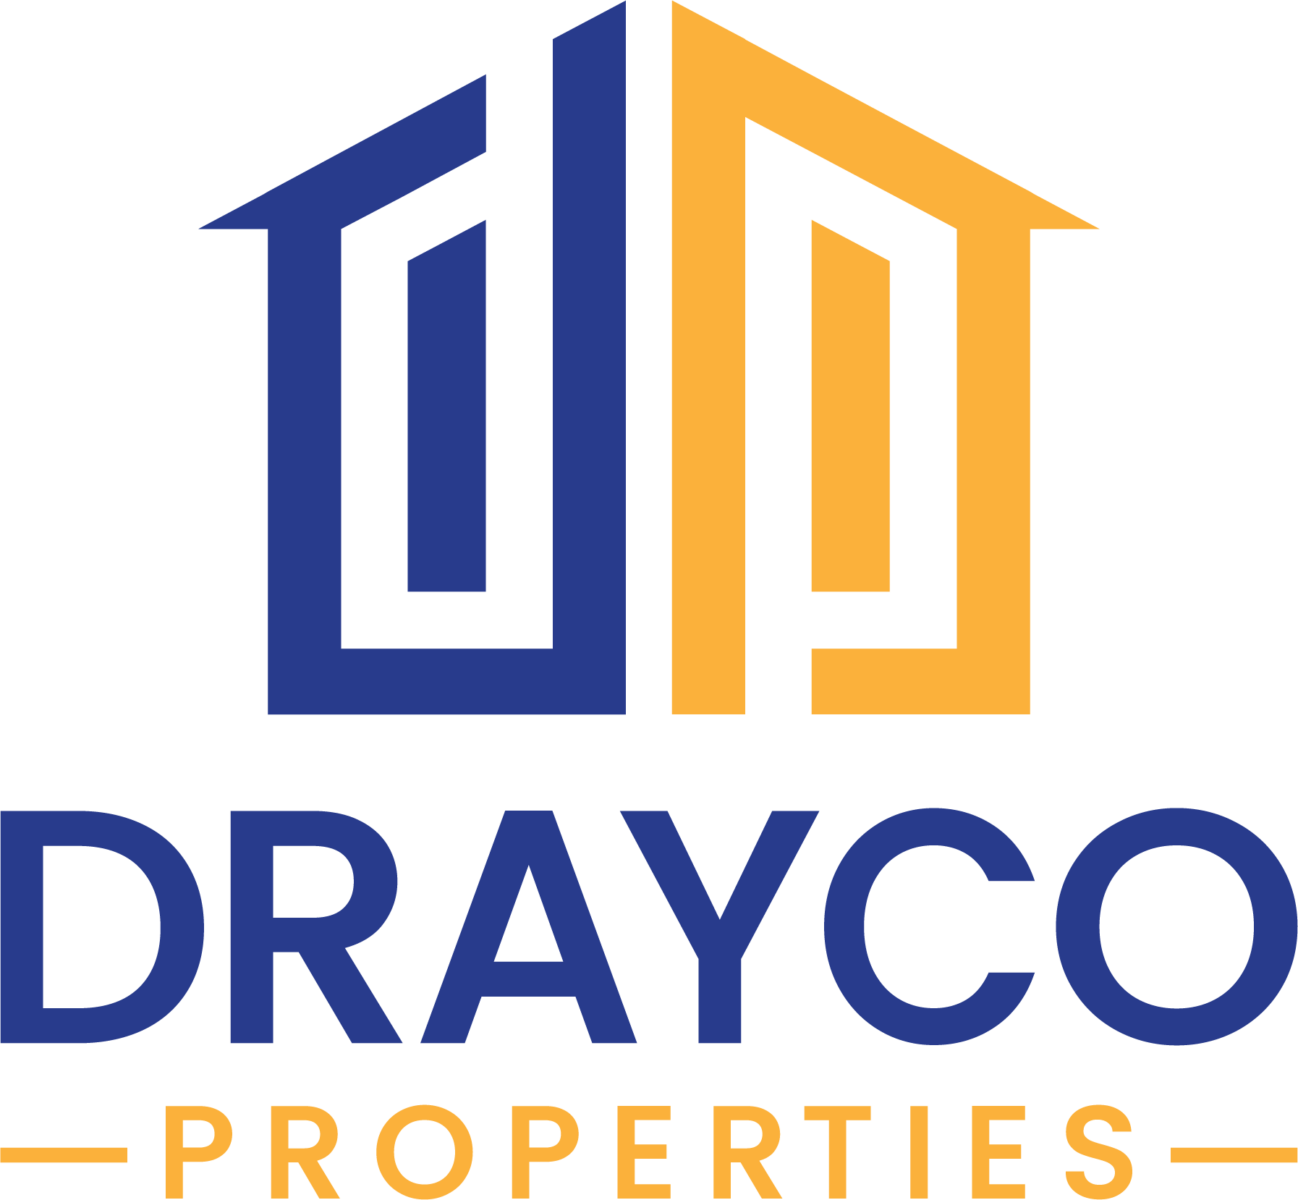 Drayco Properties logo